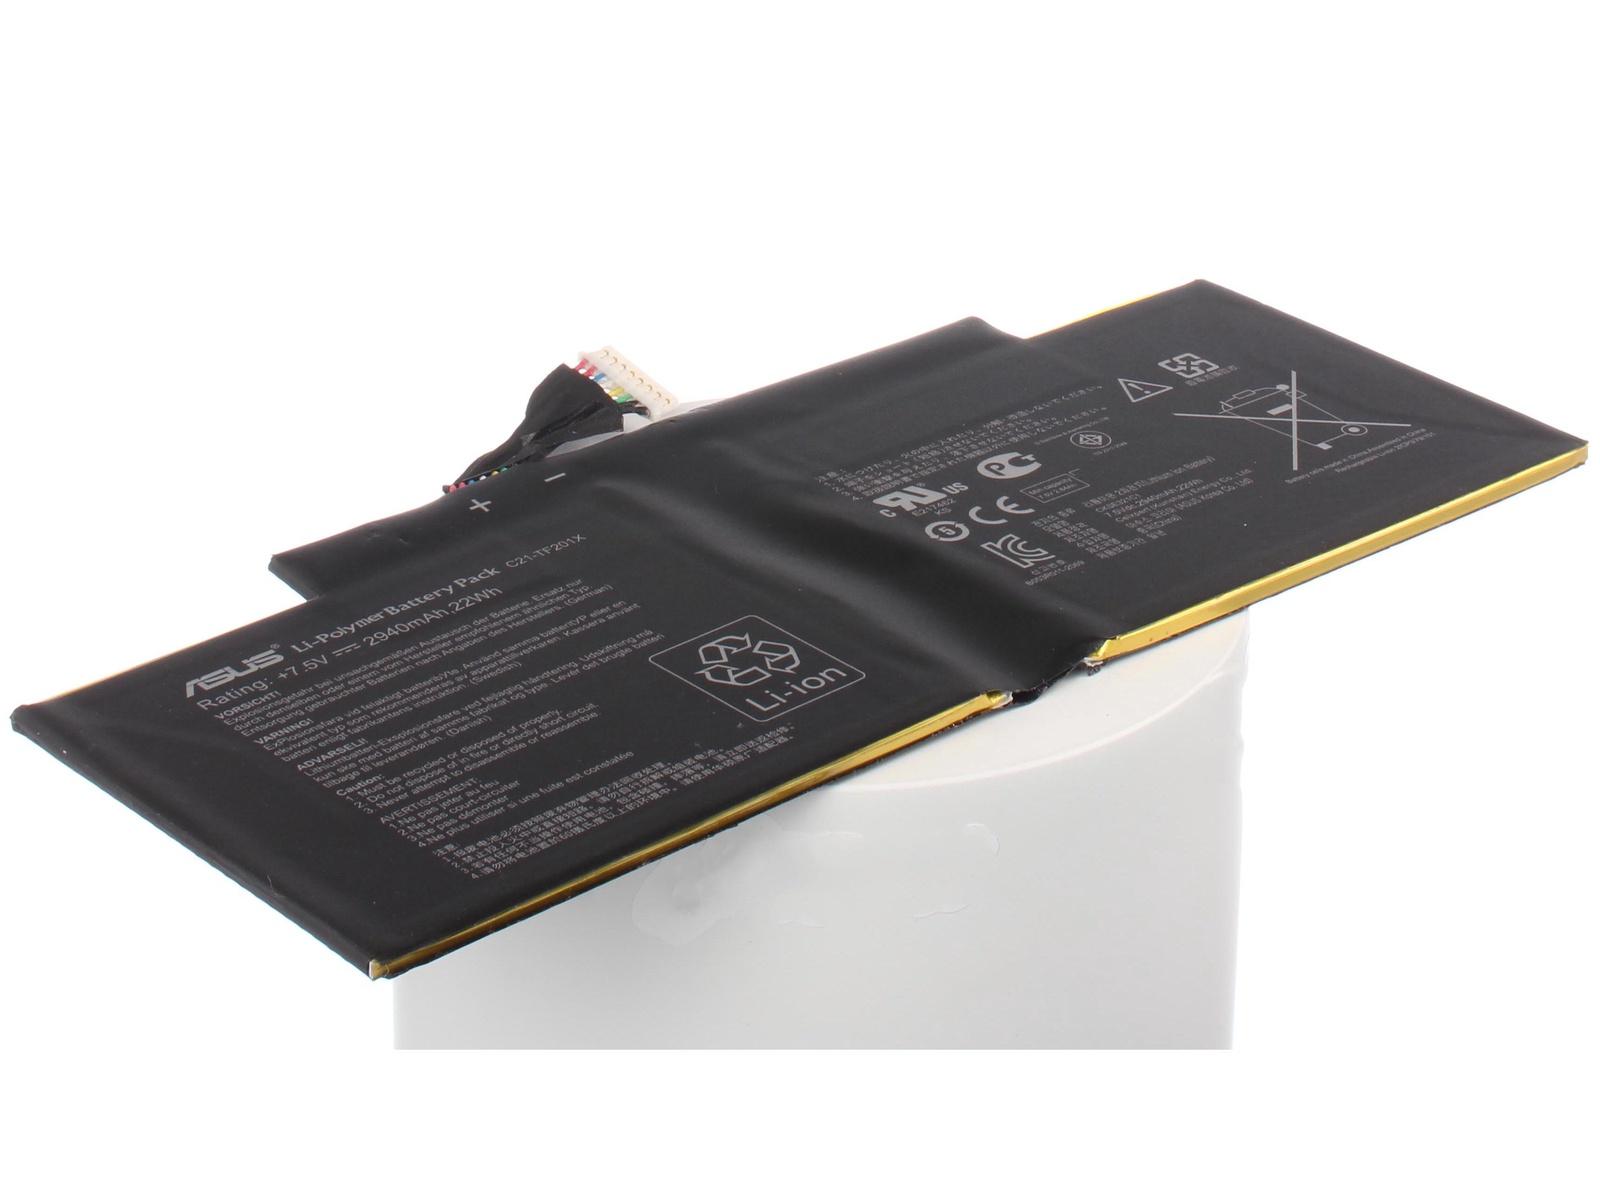 Аккумуляторная батарея iBatt iB-A1-A691 2900mAh для ноутбуков Asus аккумуляторная батарея topon top f5 6600мач для ноутбуков asus f5m f5n f5sr f5z f5ri f5sl f5vi f5vl x5 x50c x50m x50n x50rl x50sl x50vl